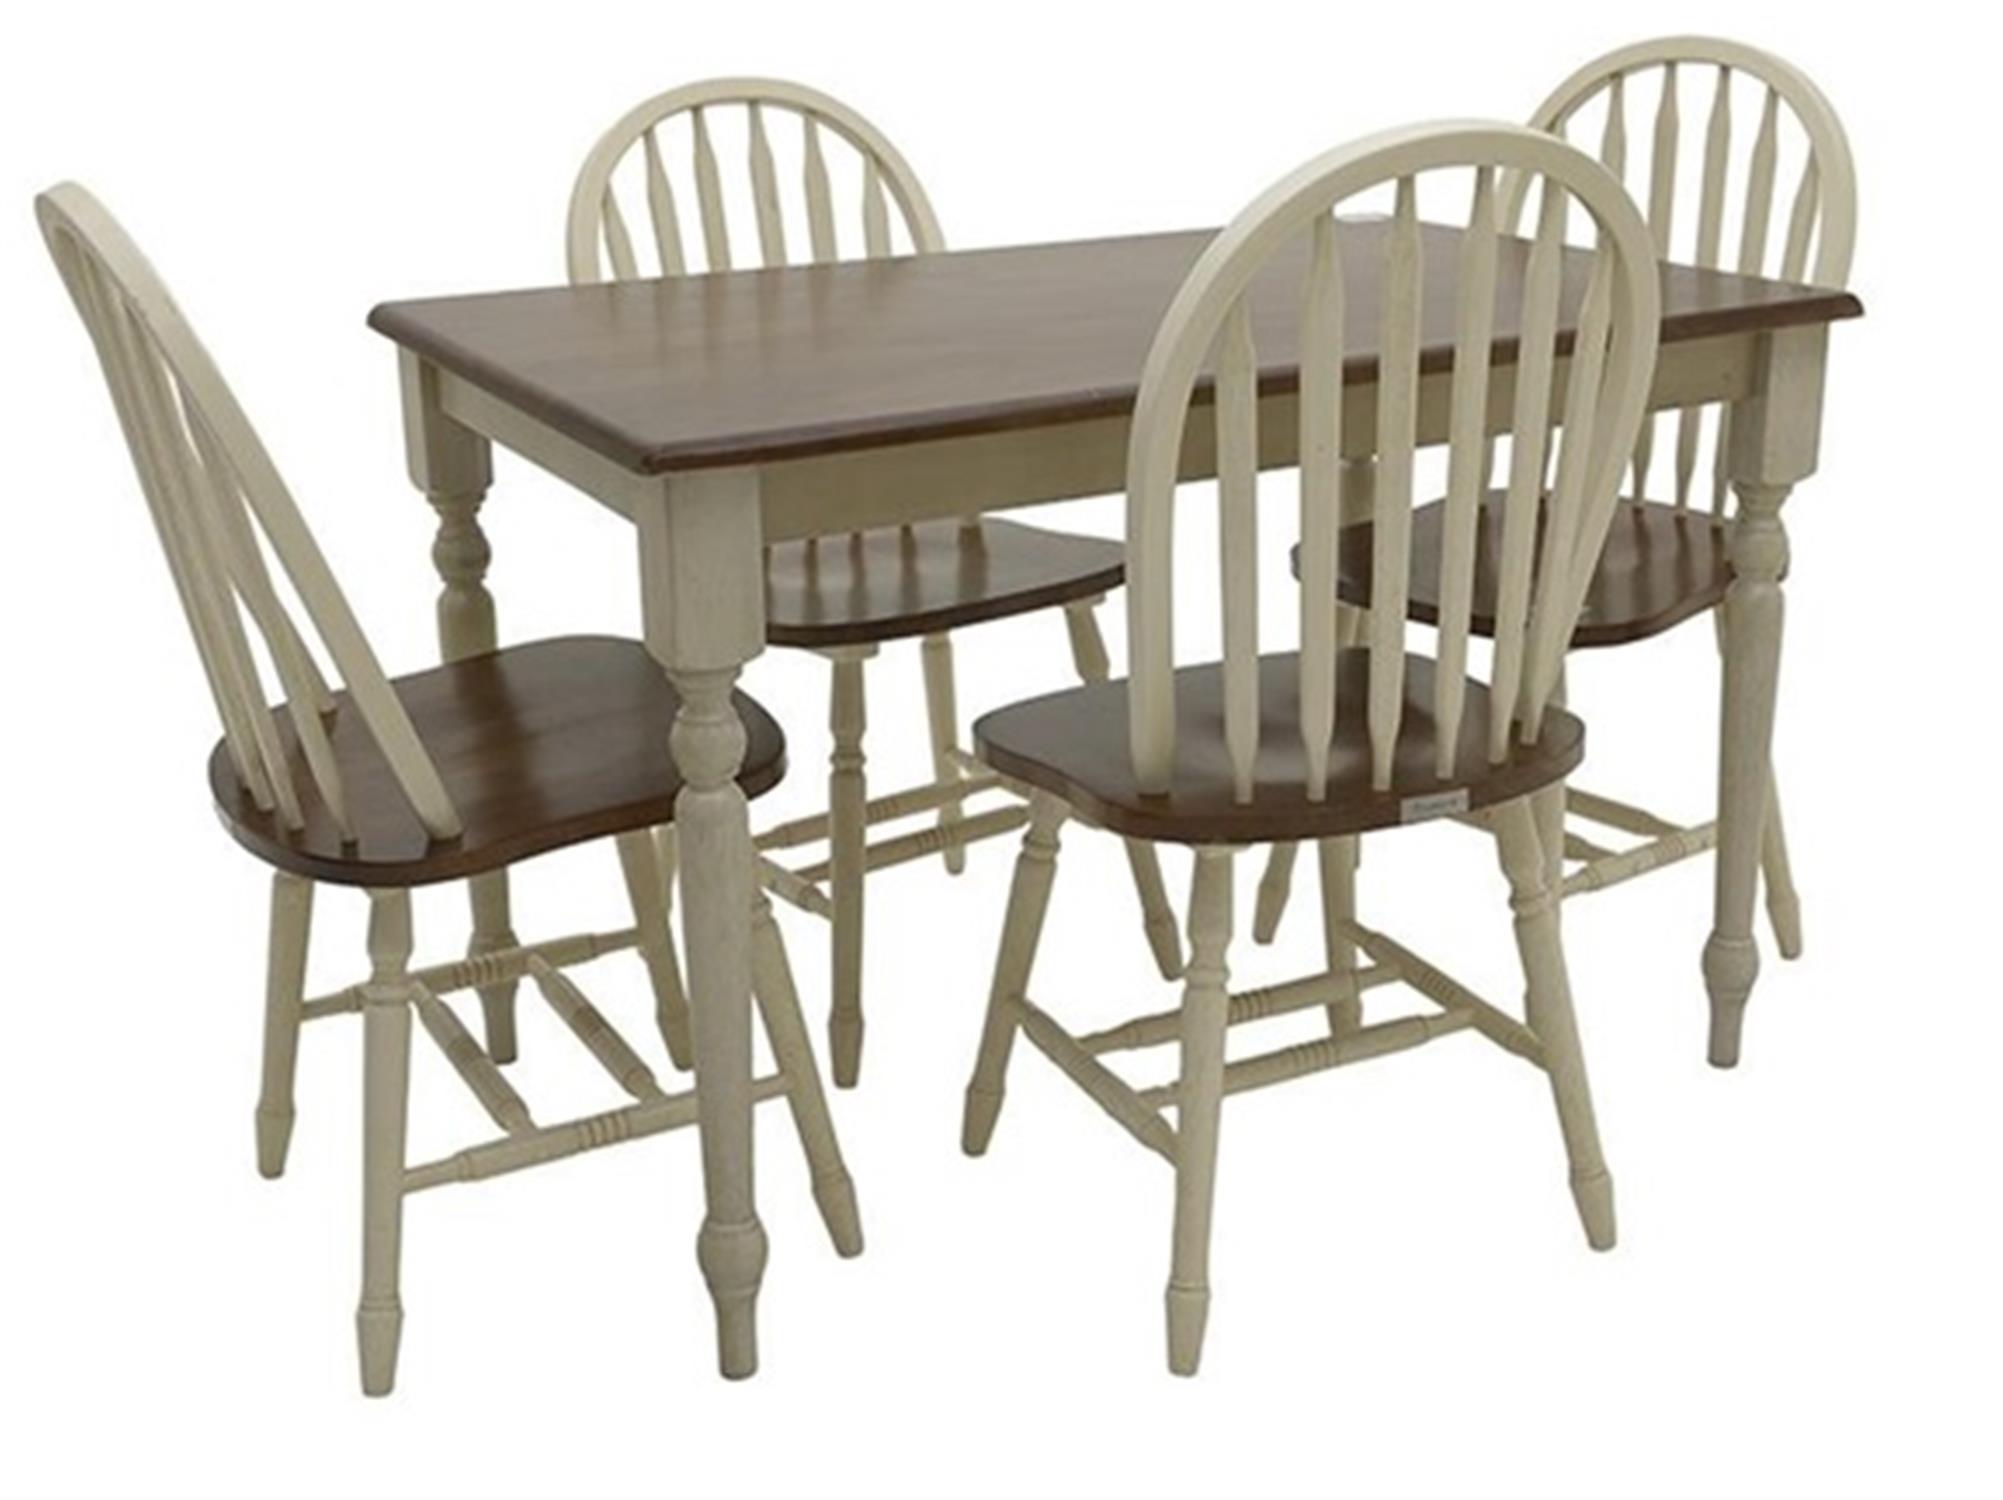 S/5 Τραπέζι Oslo με 4 καρέκλες Boston ξύλινο decape κρεμ/καφέ 120x75x75cm Home Plus 02.01.0079-1